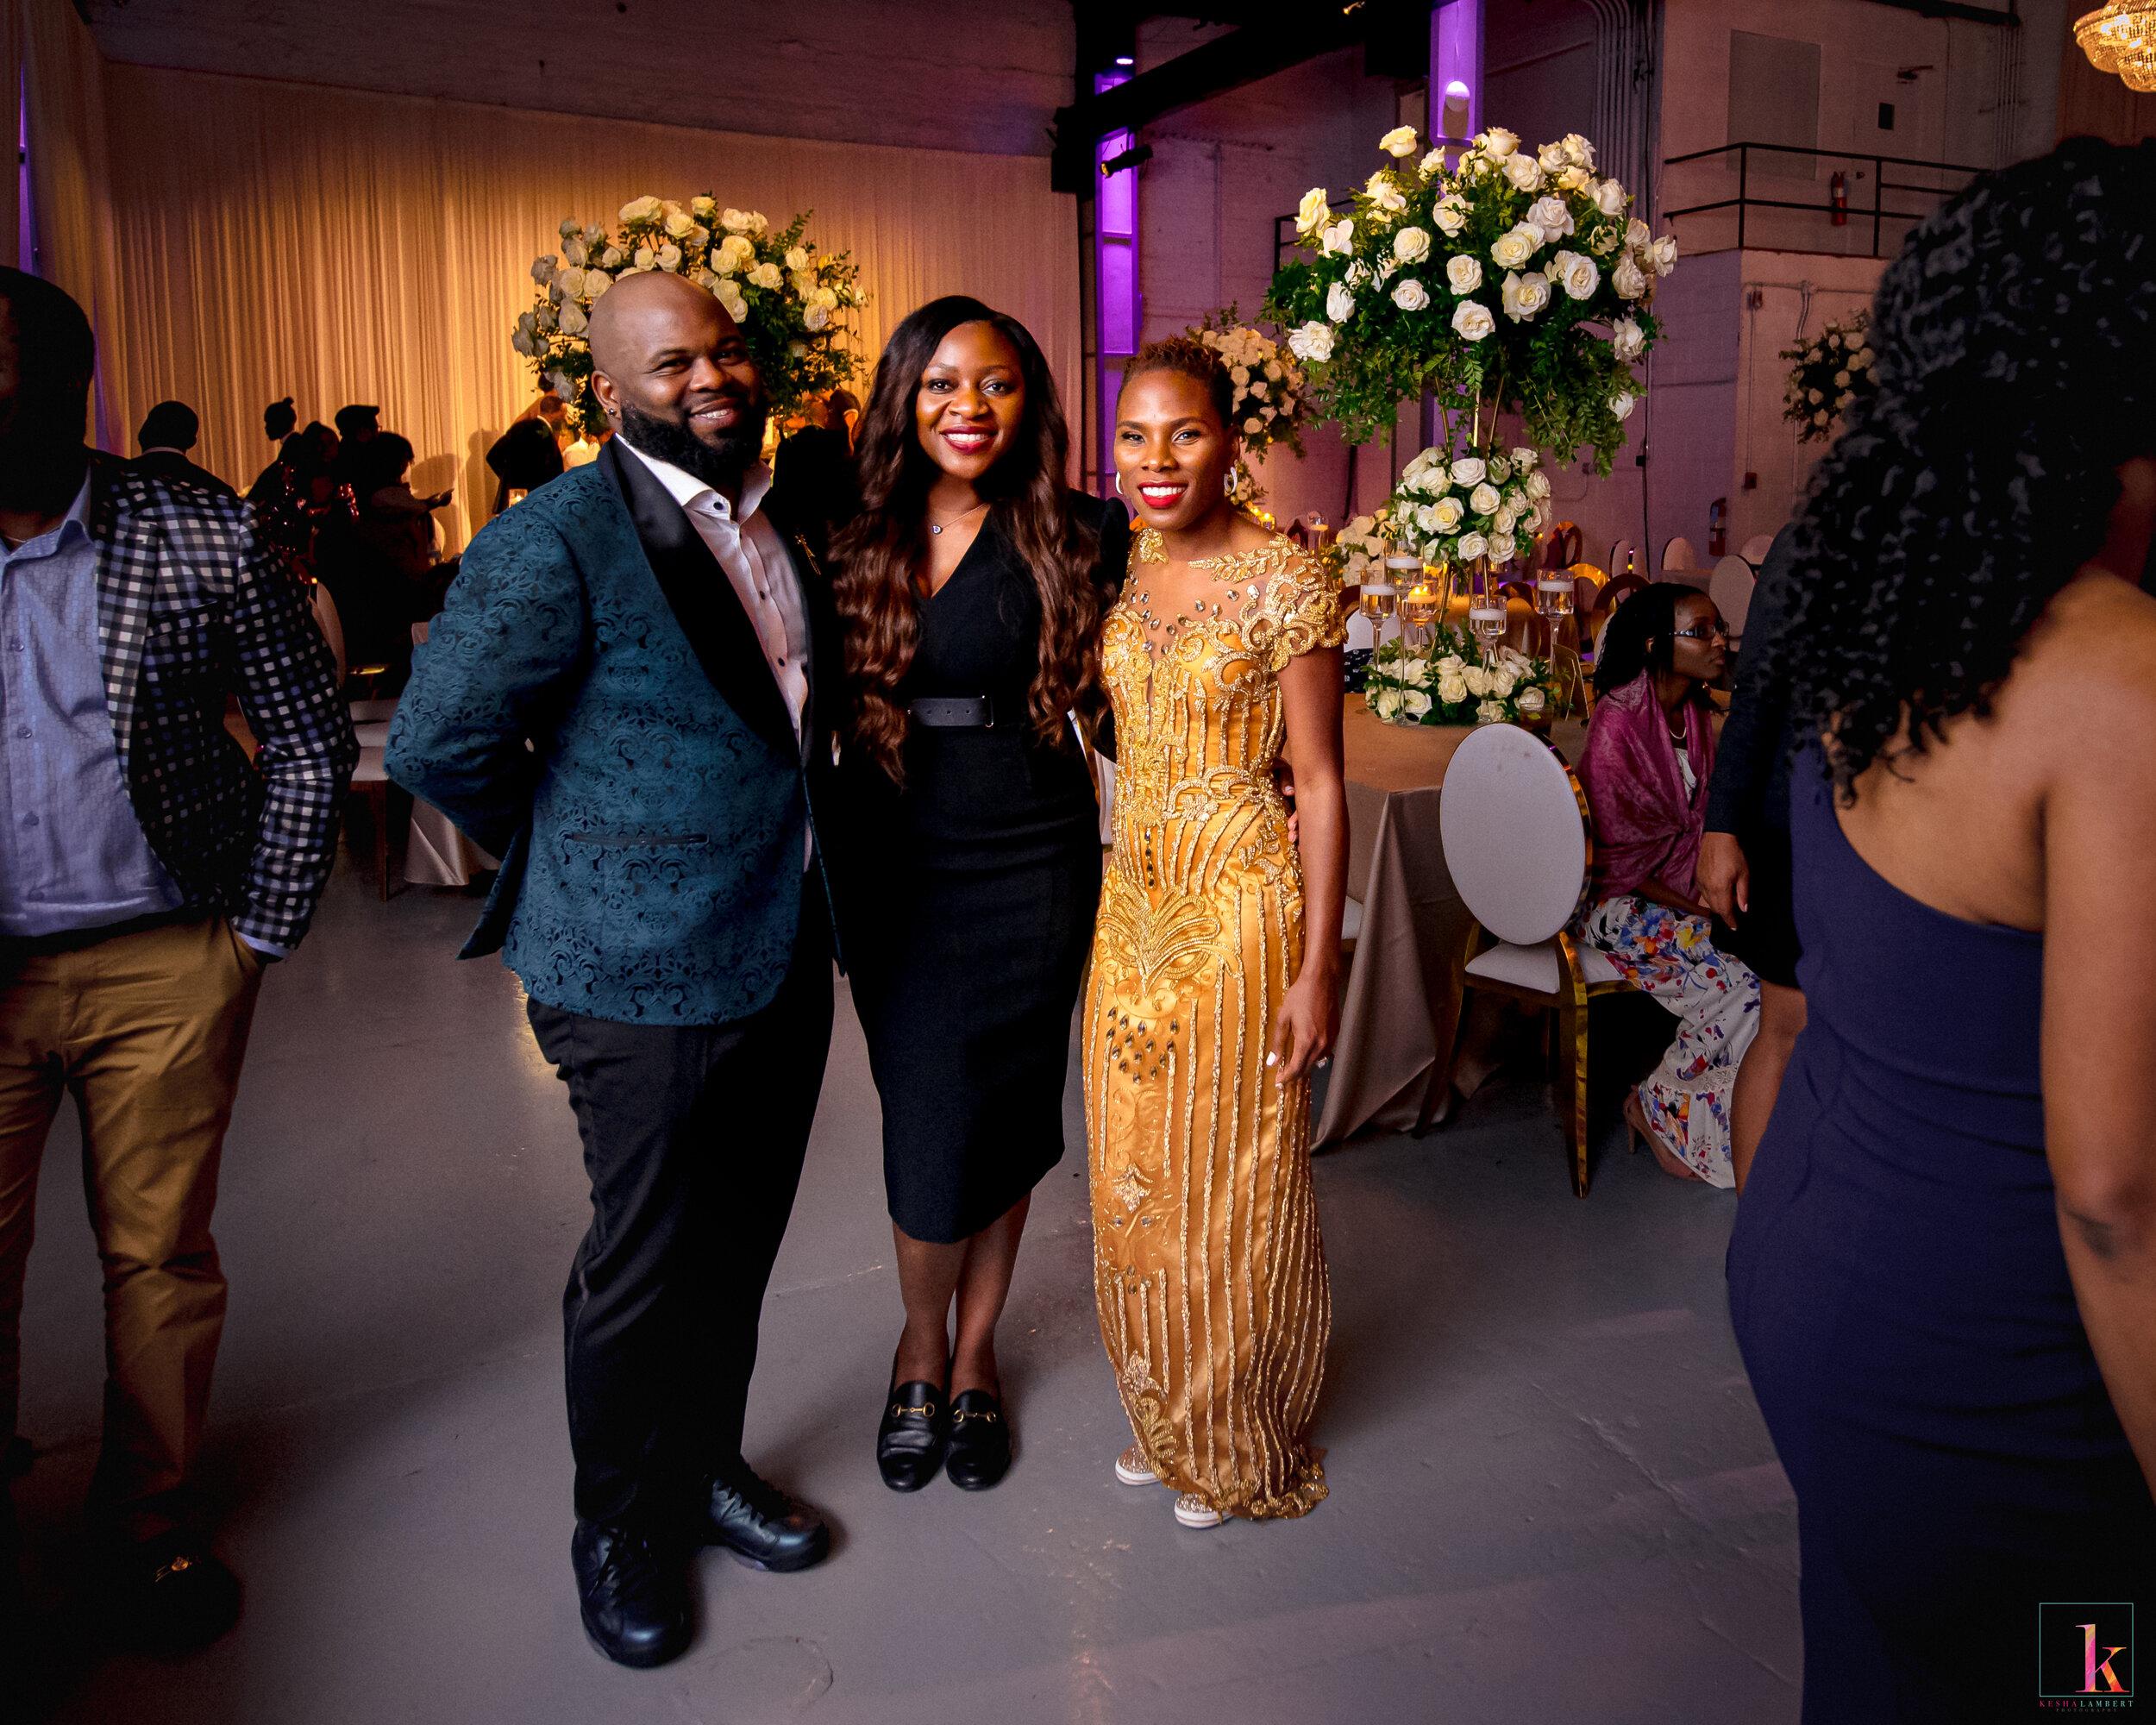 Luvvie Ajayi and Carnell Jones Wedding Celebration planner Akeshi akinseye